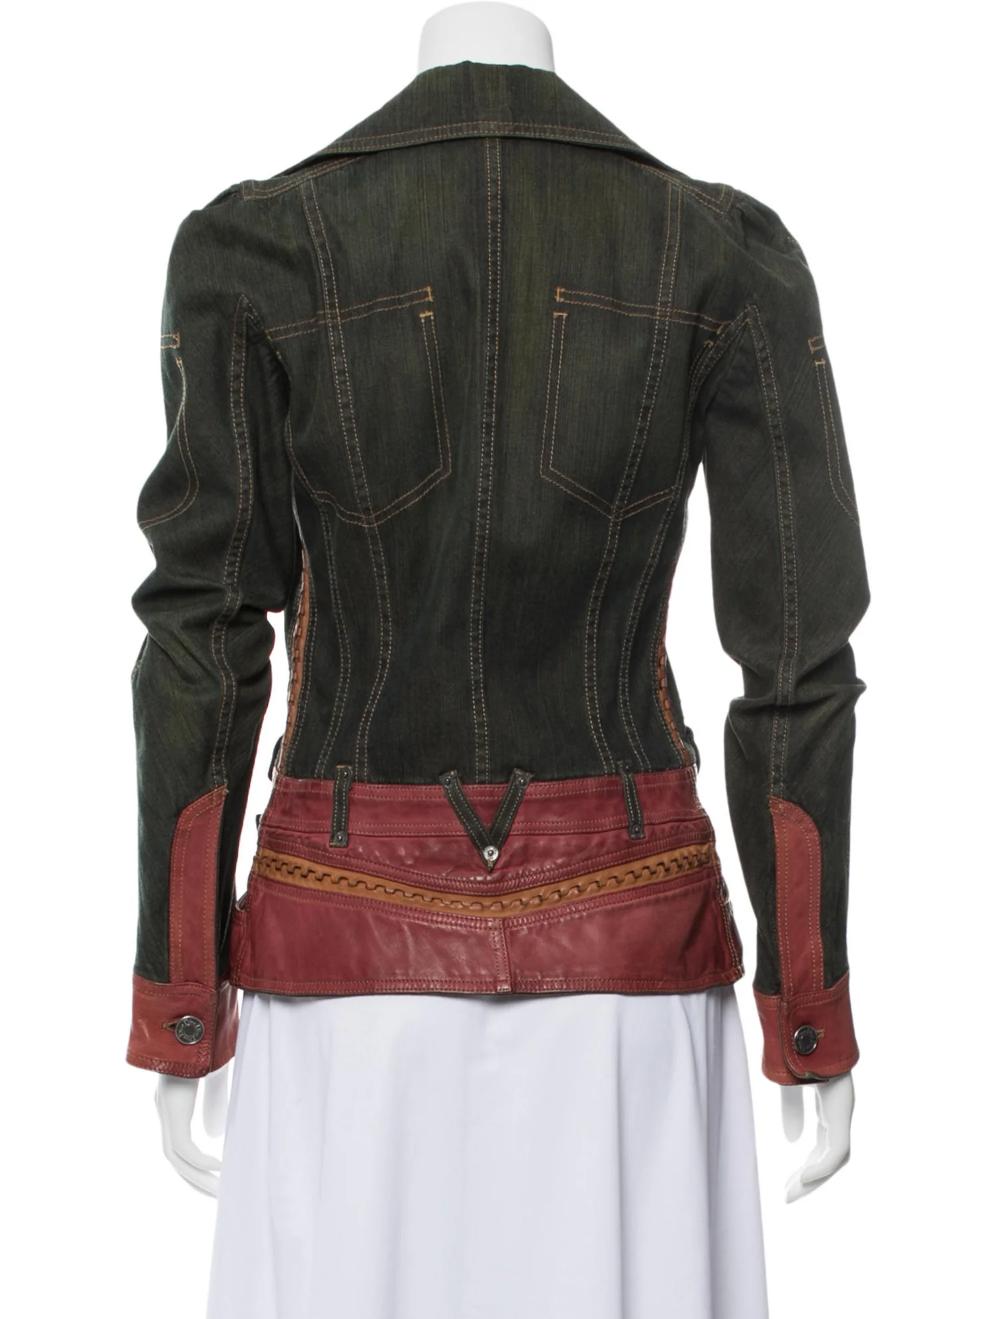 Christian Dior Denim Jacket Clothing Chr104524 The Realreal Denim Jacket Jackets Jacket Outfits [ 1319 x 1000 Pixel ]